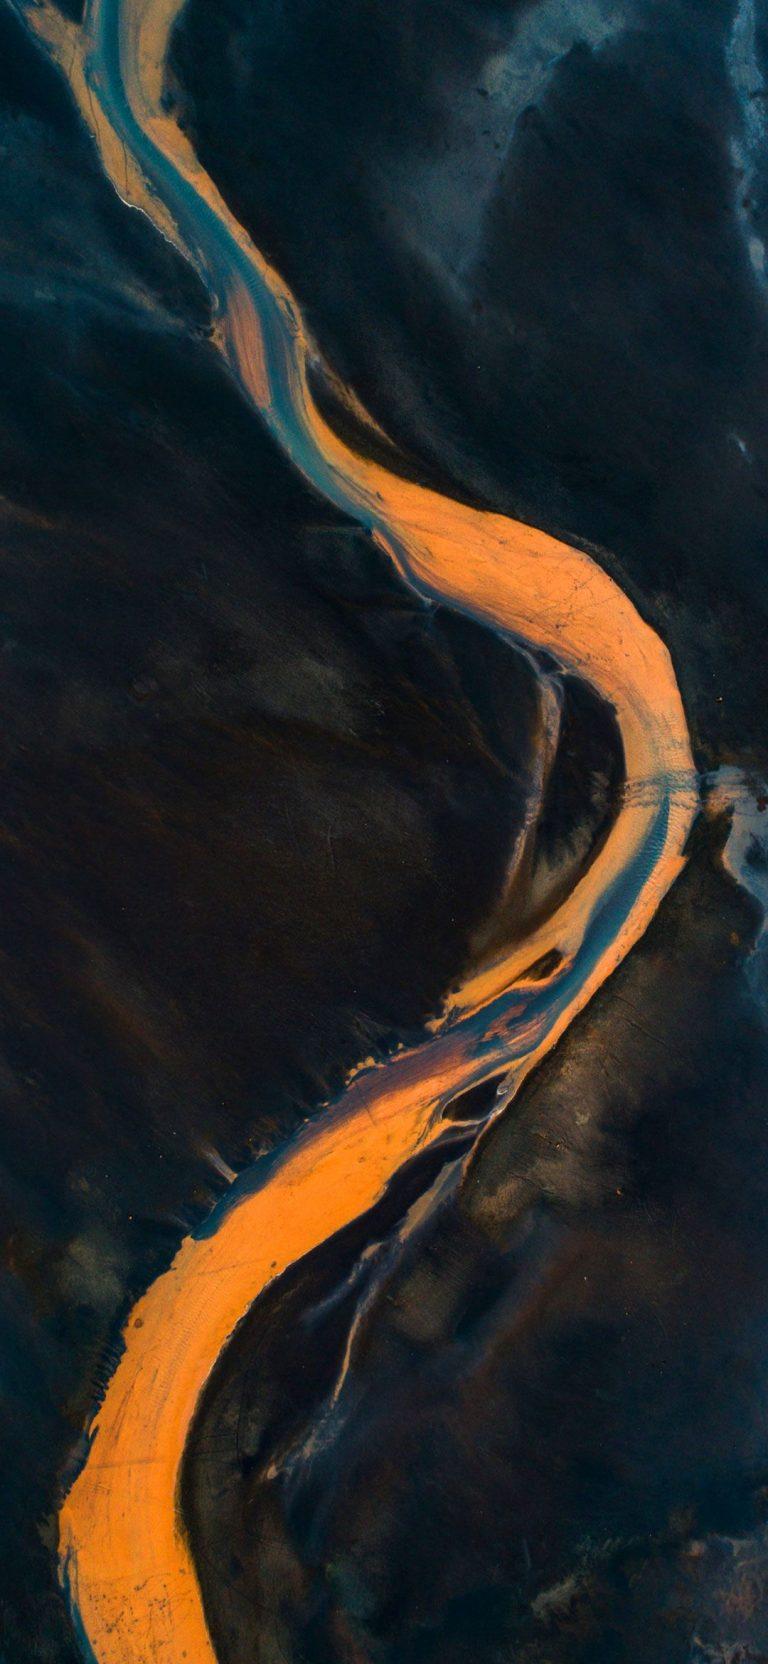 Realme Narzo 10 Wallpaper [1080x2340] - 13